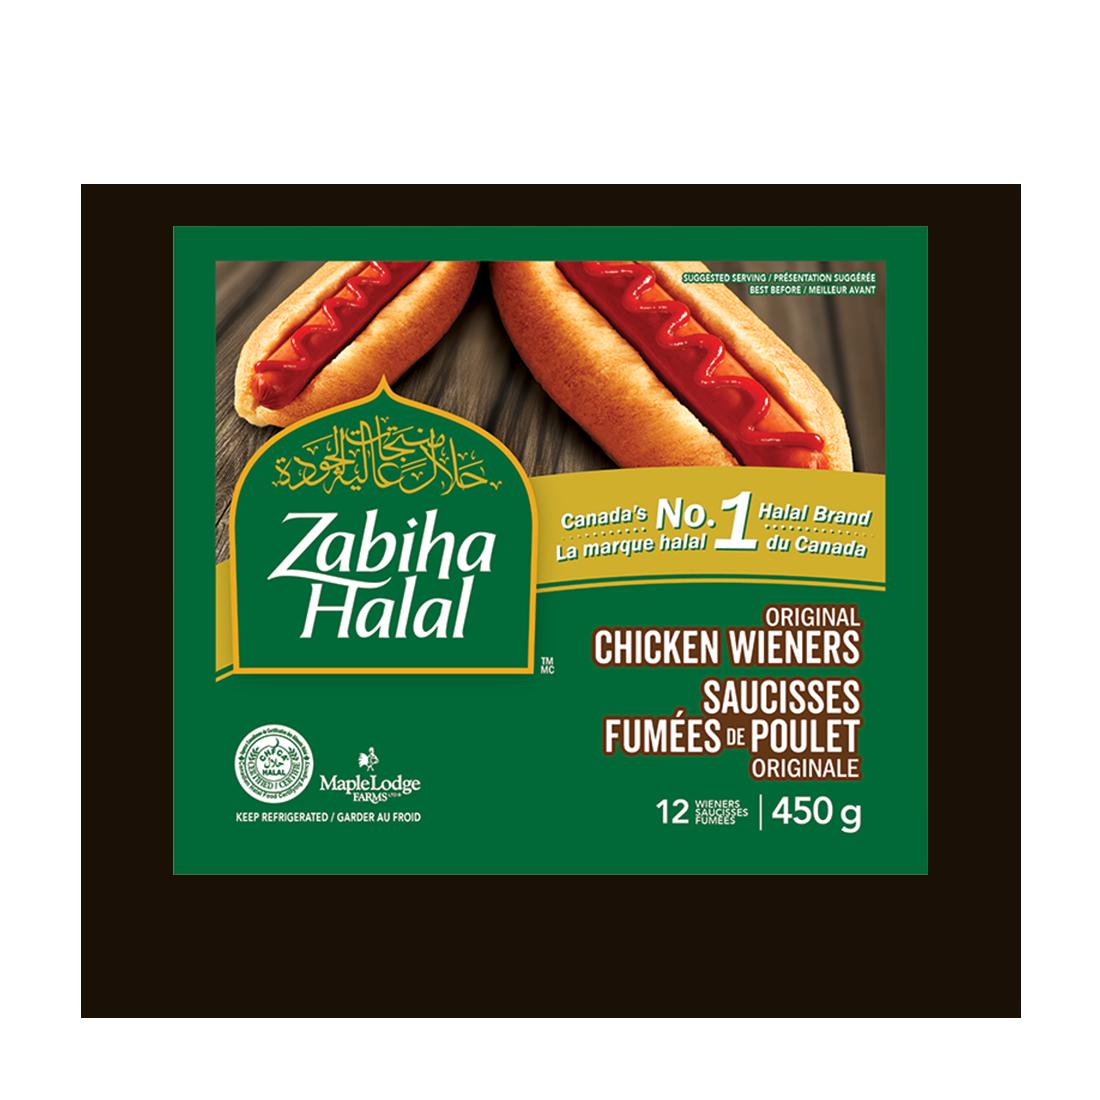 A package of Original Chicken Wieners